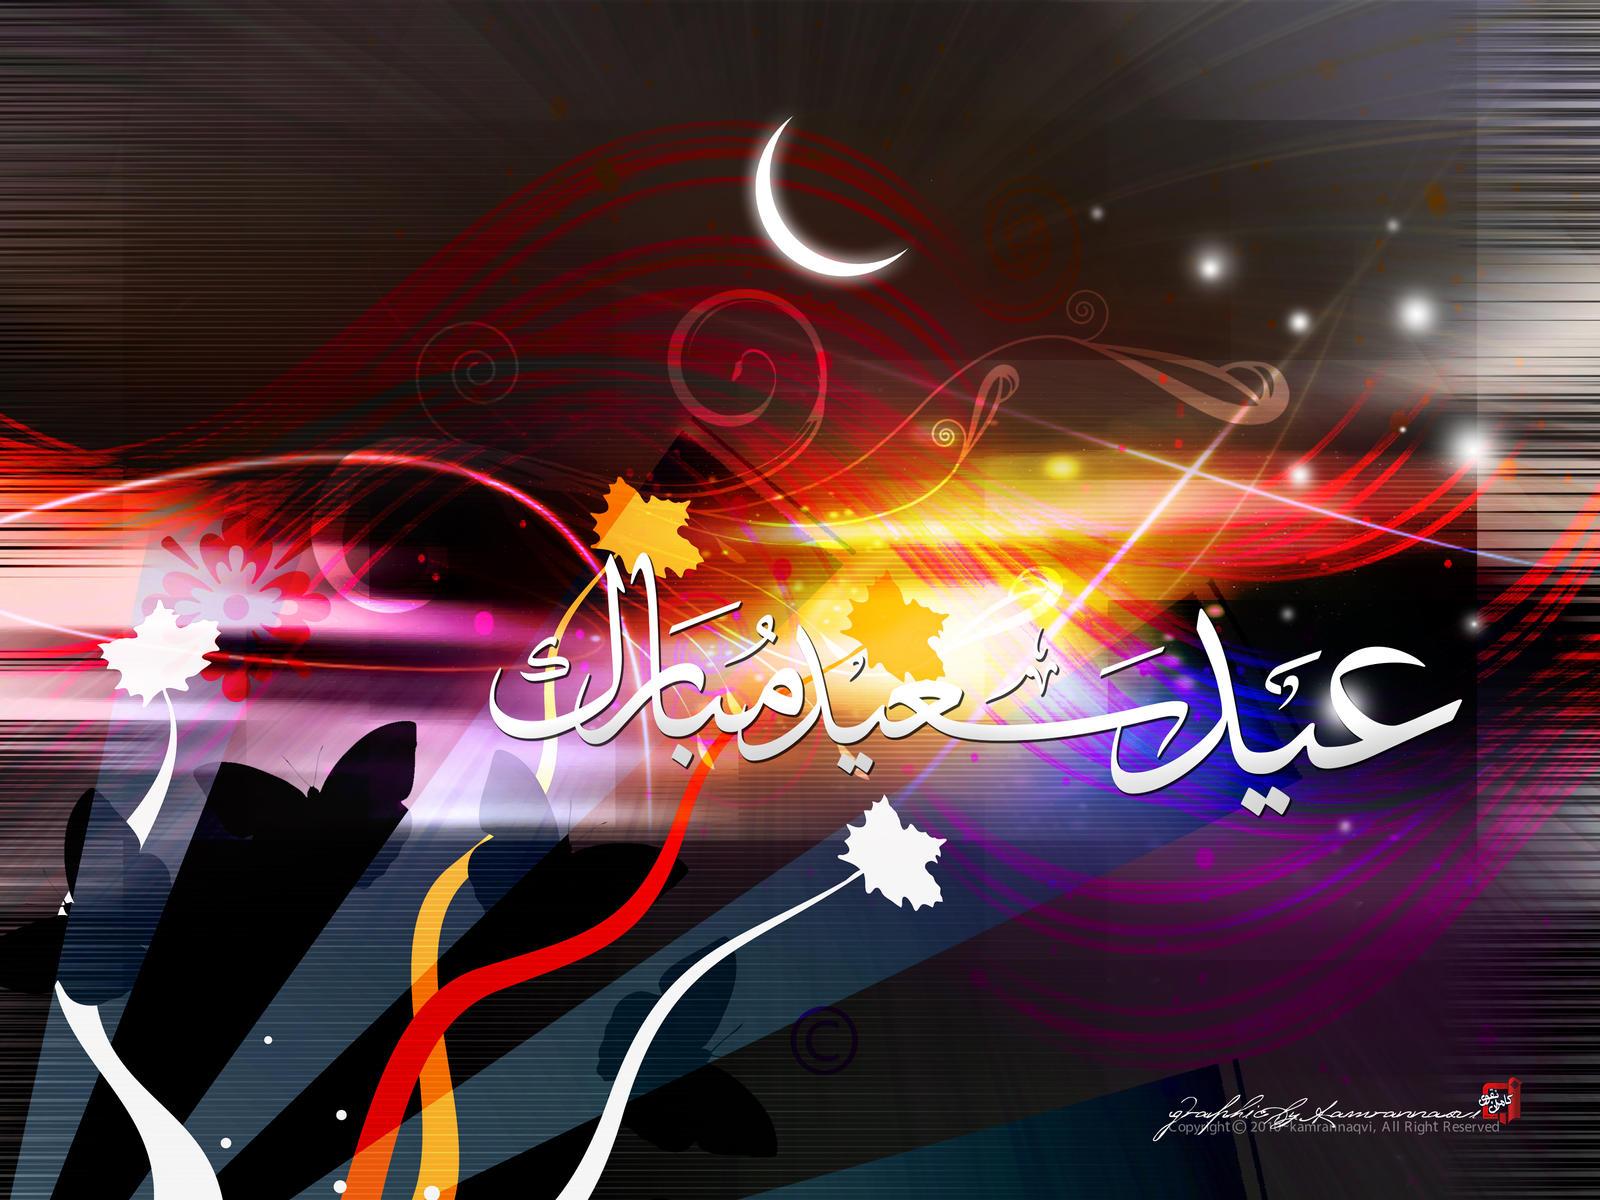 Eid e saeed mubarak 2010 by kamrannaqvi on deviantart eid e saeed mubarak 2010 by kamrannaqvi m4hsunfo